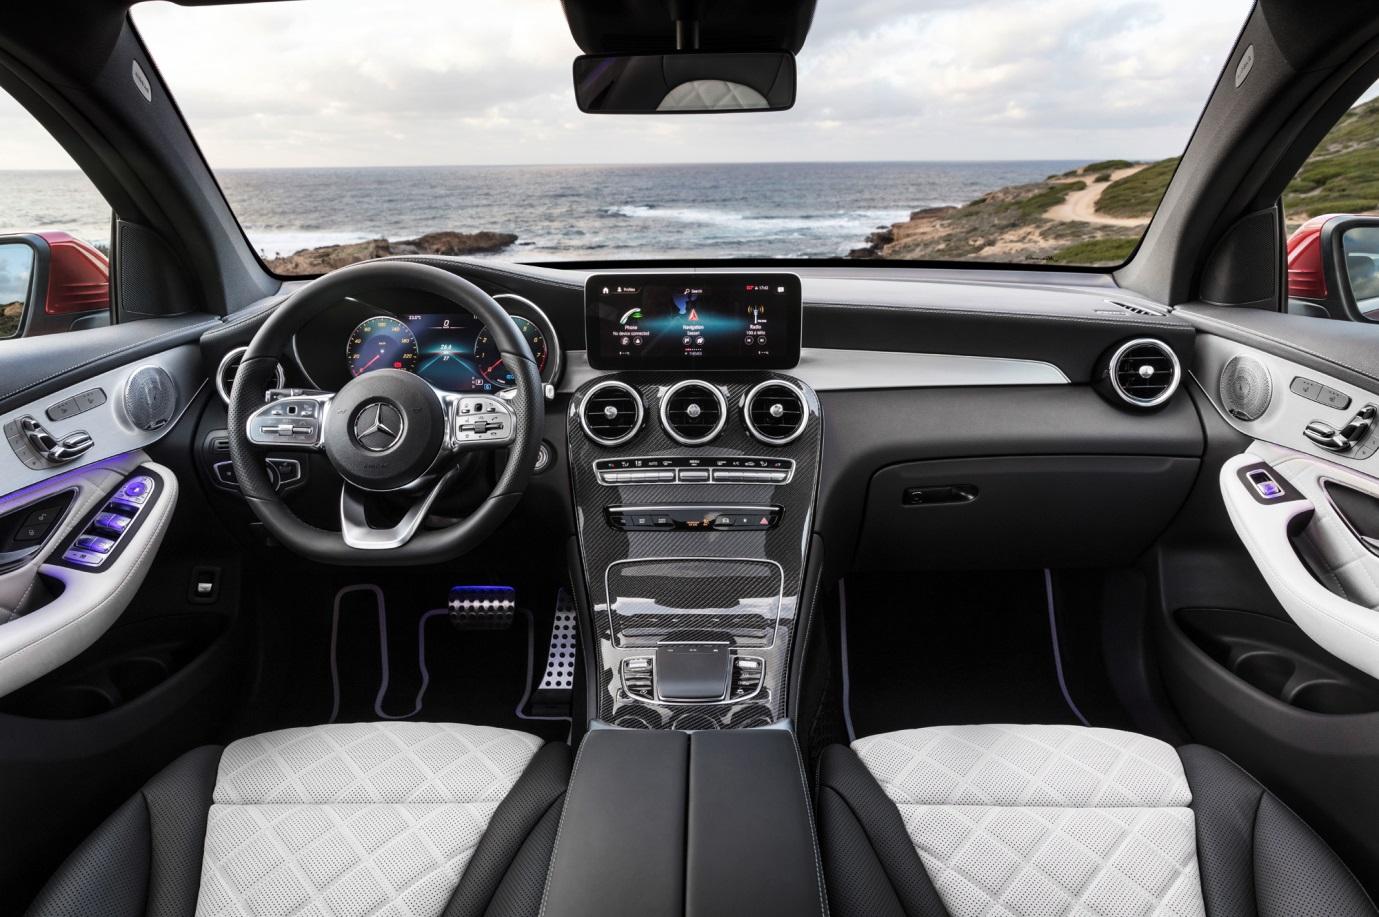 C:\Users\Jialing\Desktop\20190410\640-Car Guide\GLC-full\5c91c61fec05c43b7500003b.jpg